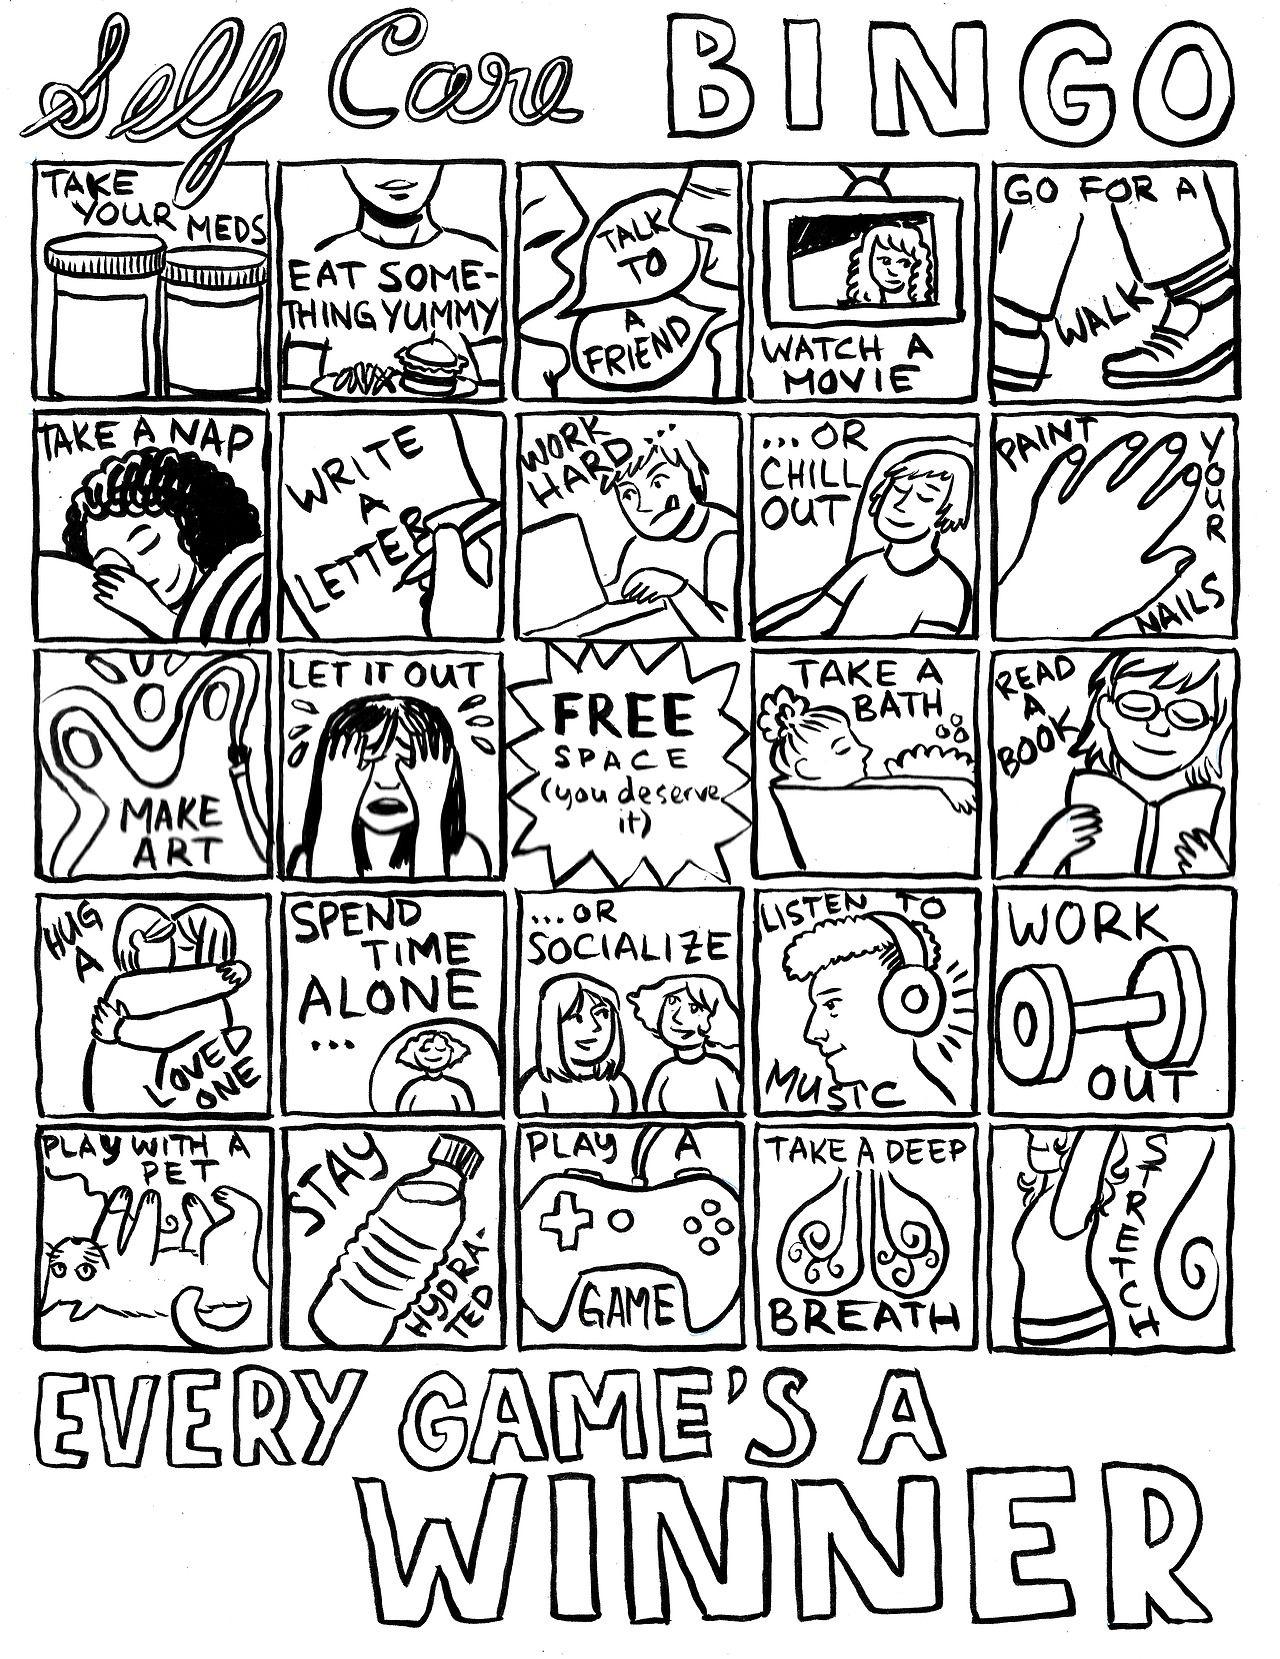 Self Care Bingo. Play daily, every game's a winner! Self